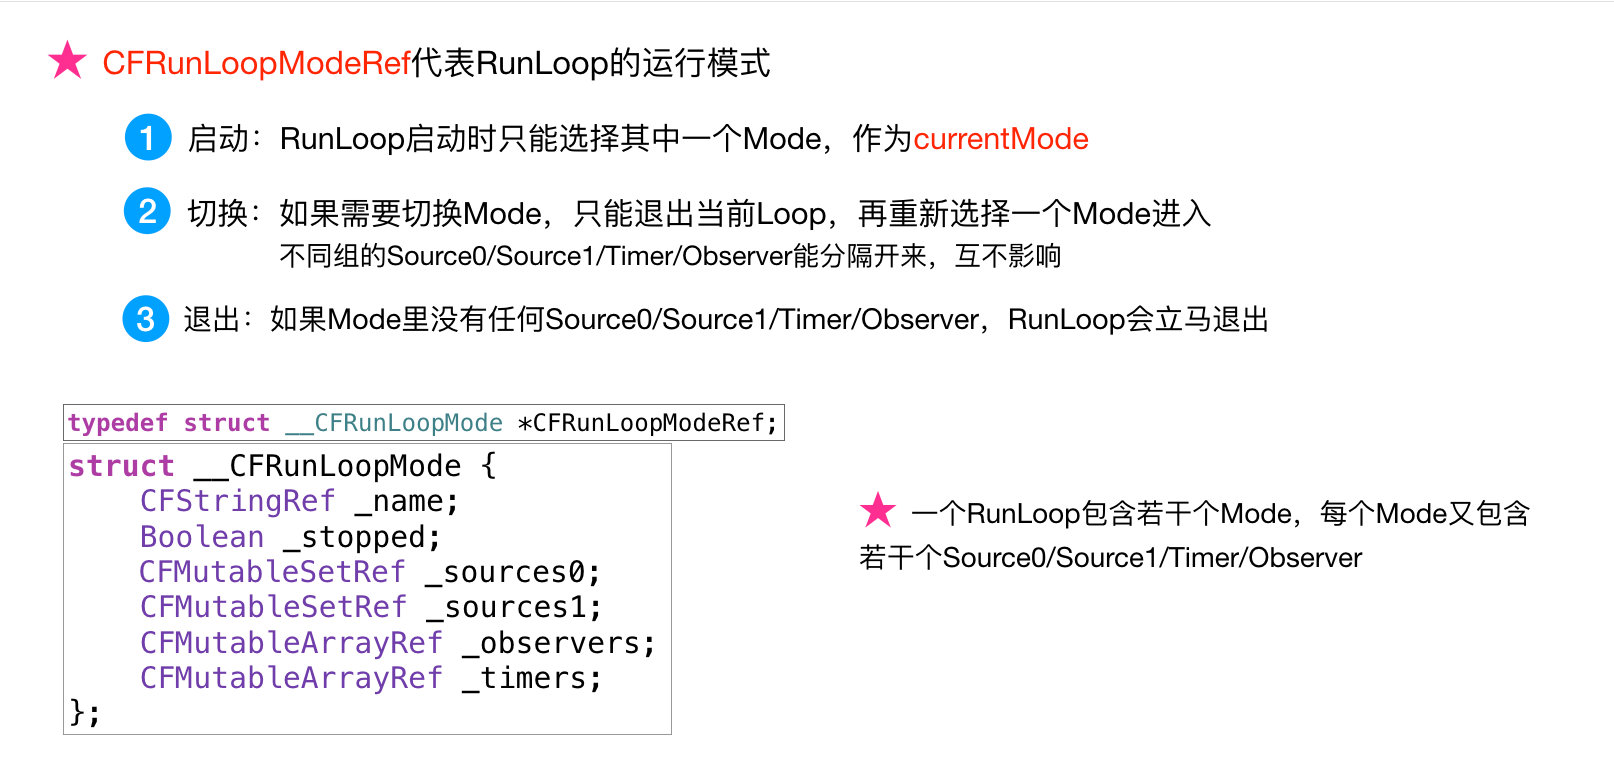 CFRunLoopModeRef